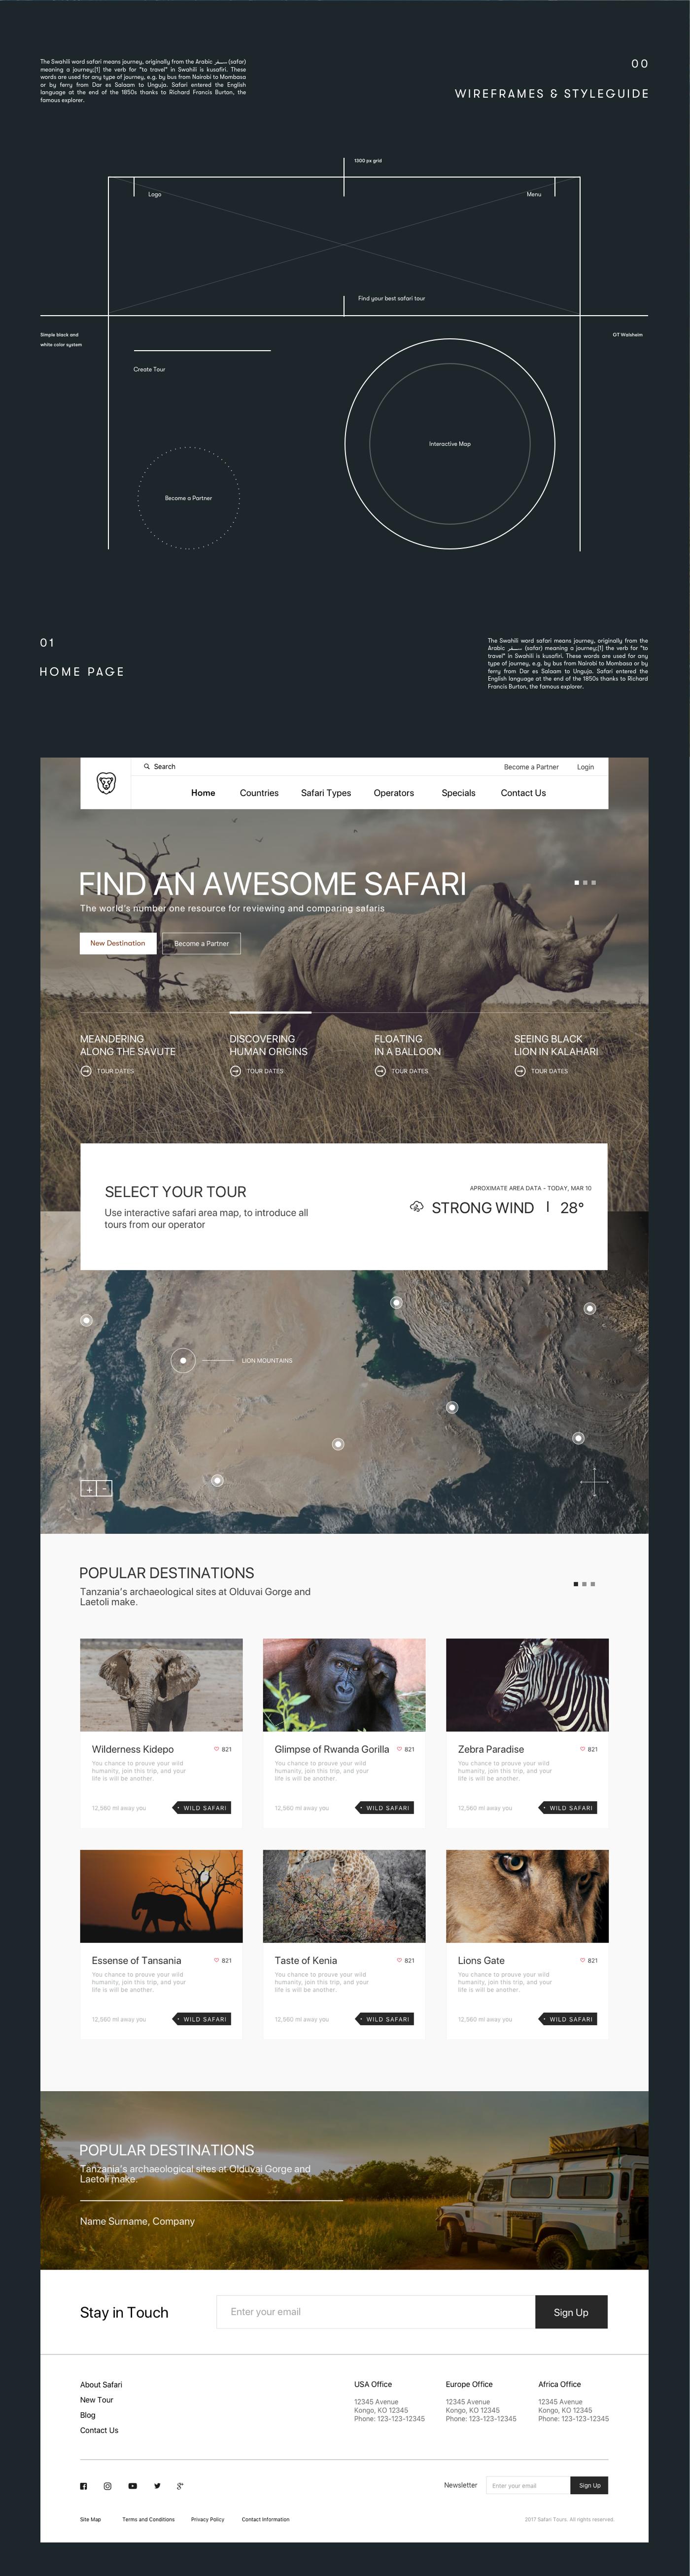 Travel UI ux Web design xD photoshop Illustrator Adobe XD after effects